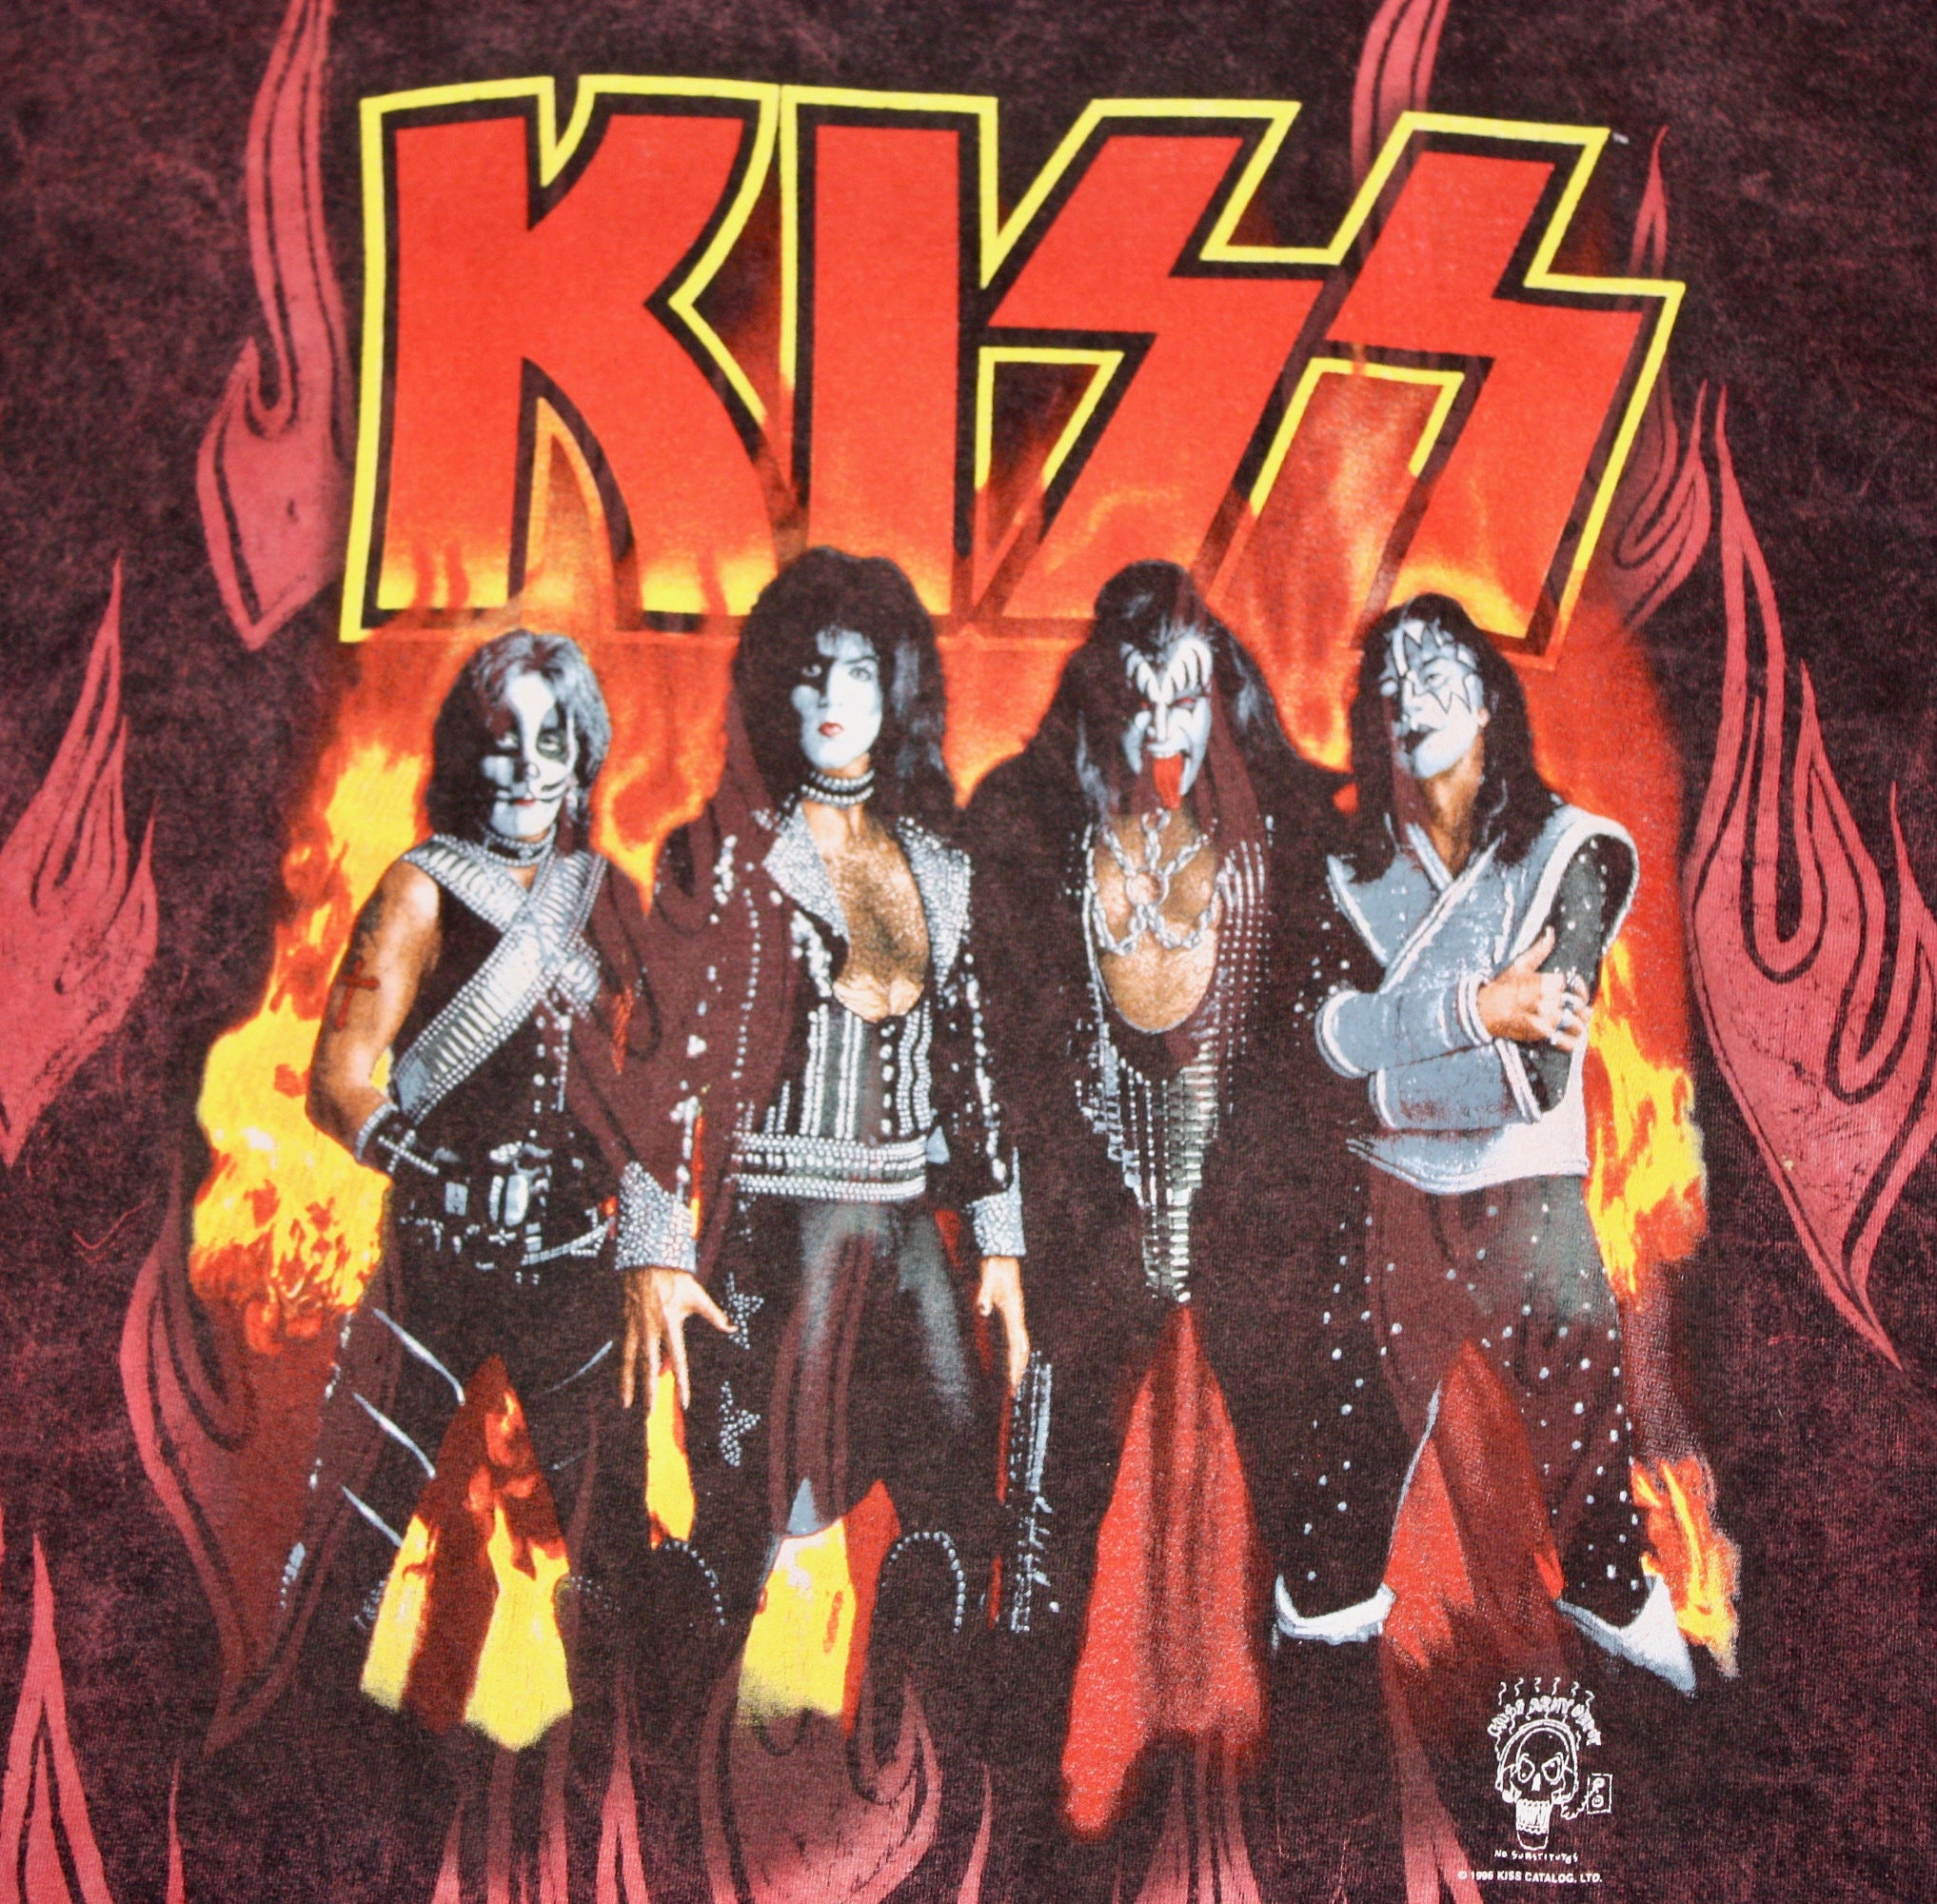 XL/XXL * vtg 90s 1996 KISS Acid Wash all over print t shirt * band